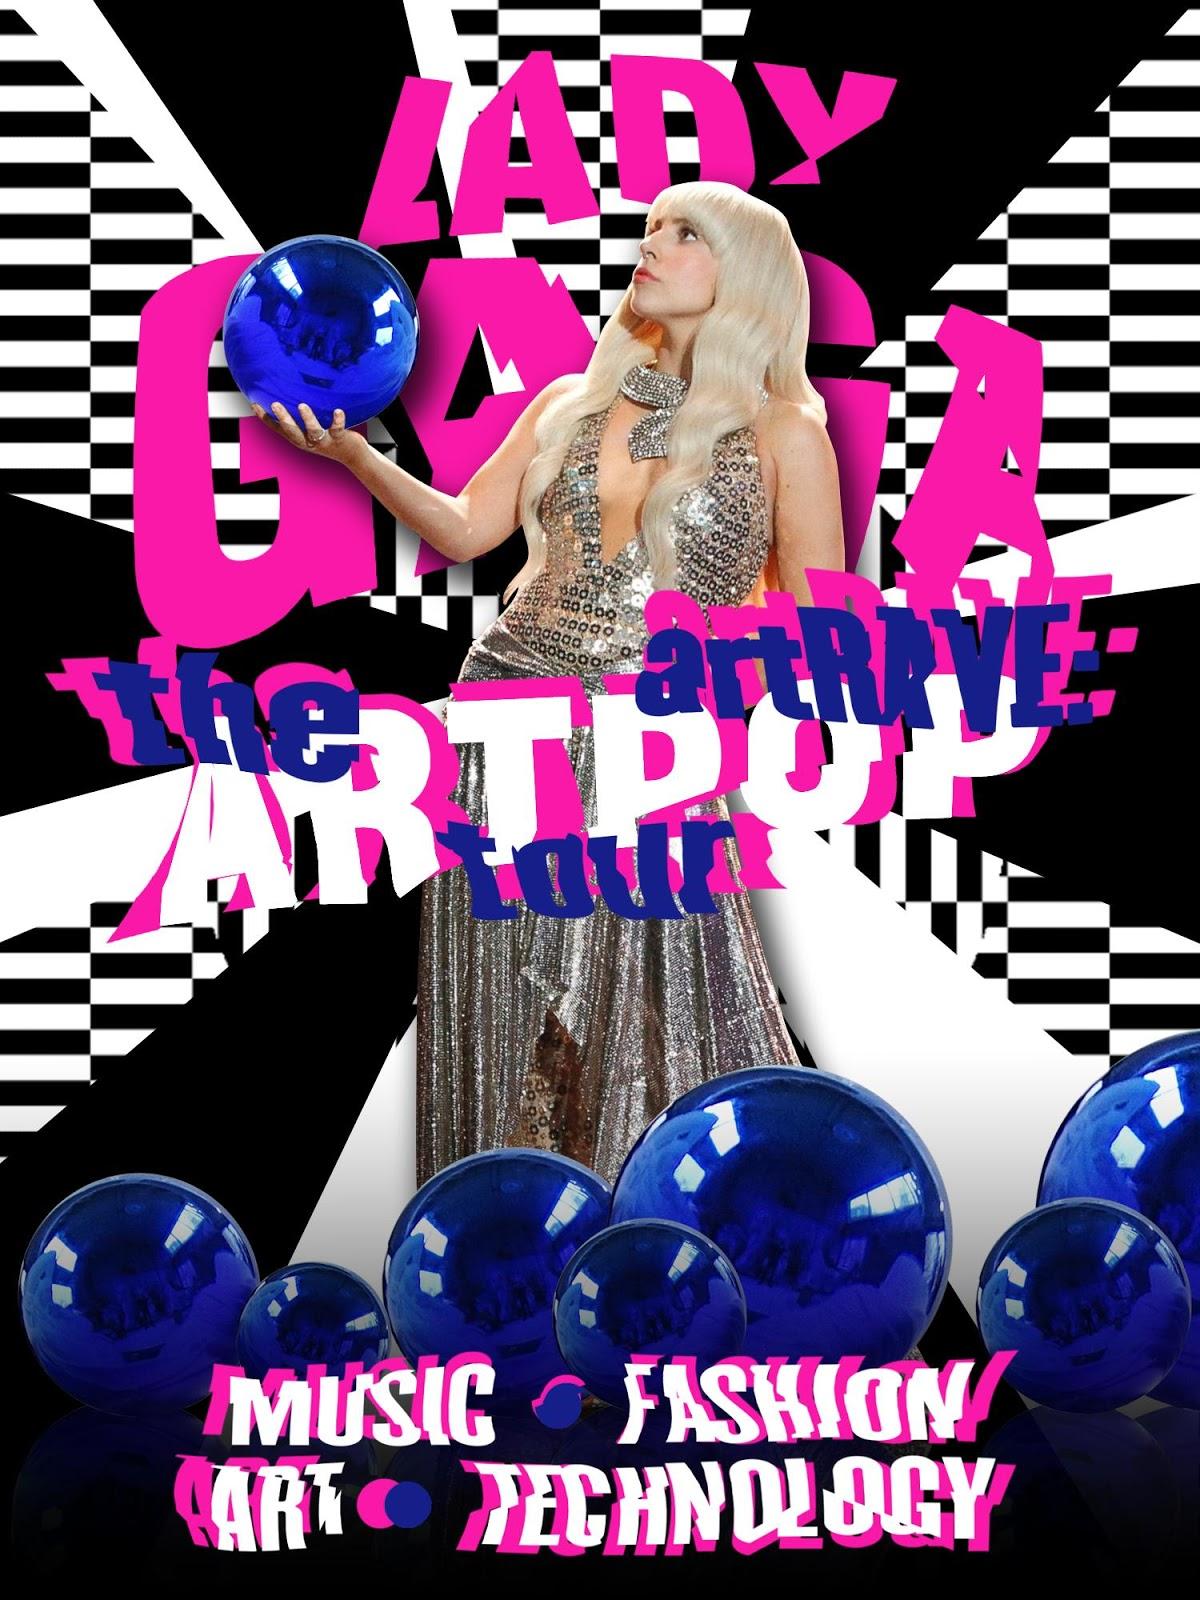 Lady Gaga Fanmade Covers: Artpop - Vinyl